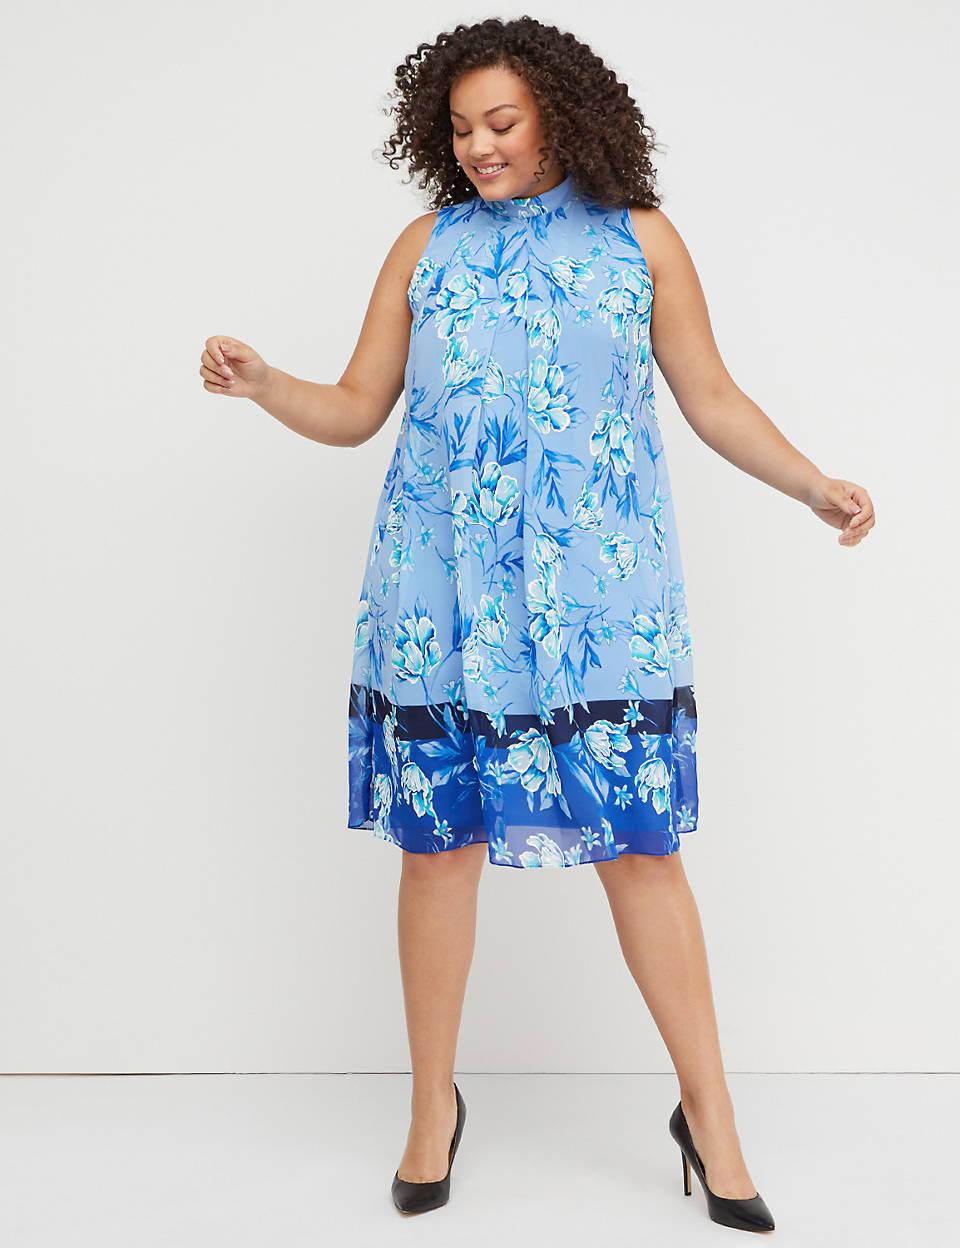 985034c697c6c Floral Mock-Neck Swing Dress | Lane Bryant